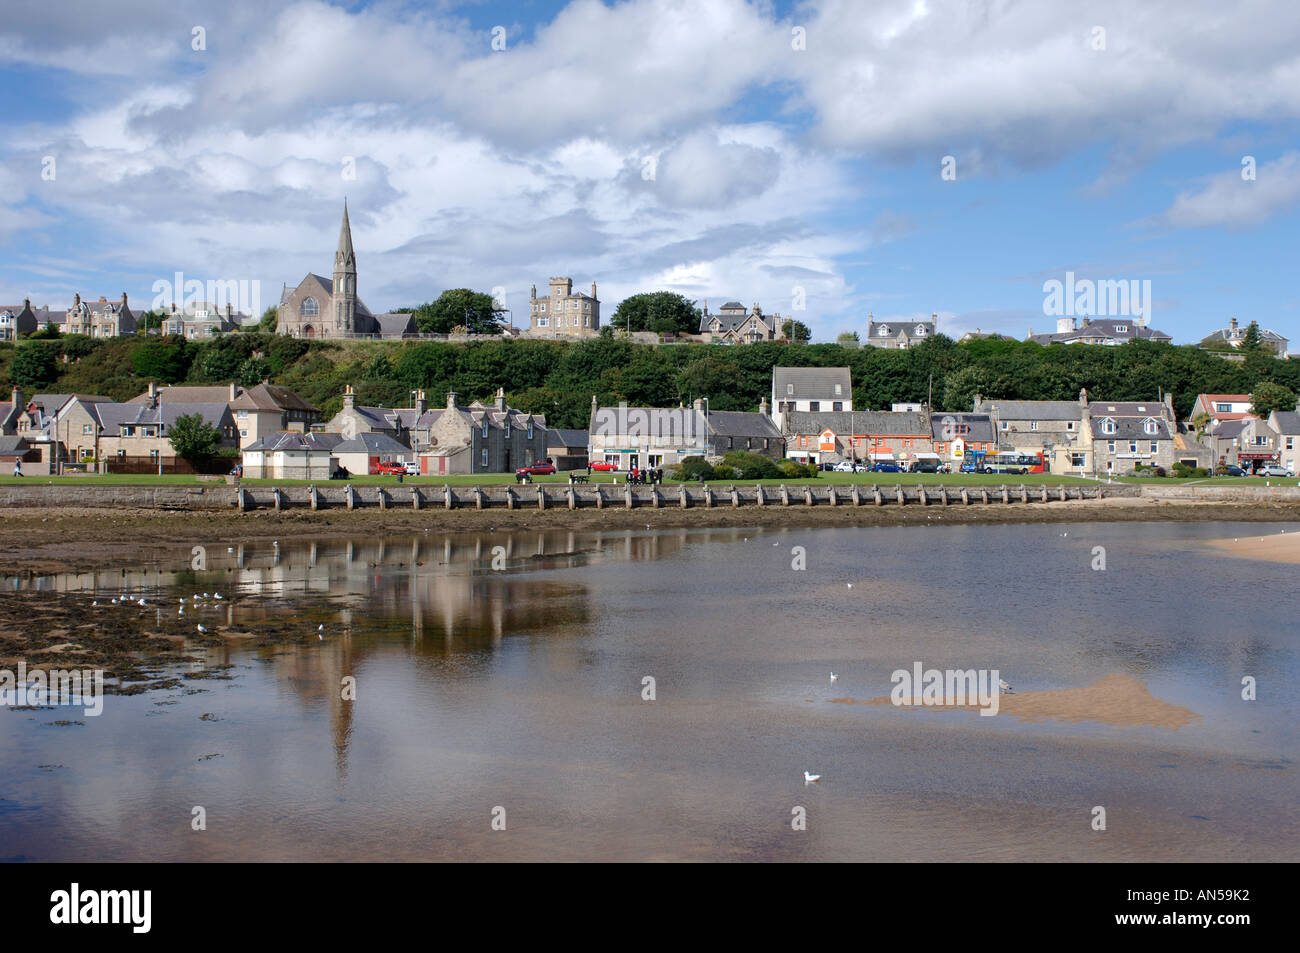 Lossiemouth coastal town, Morayshire. Scotland.  XPL 3229-321 - Stock Image